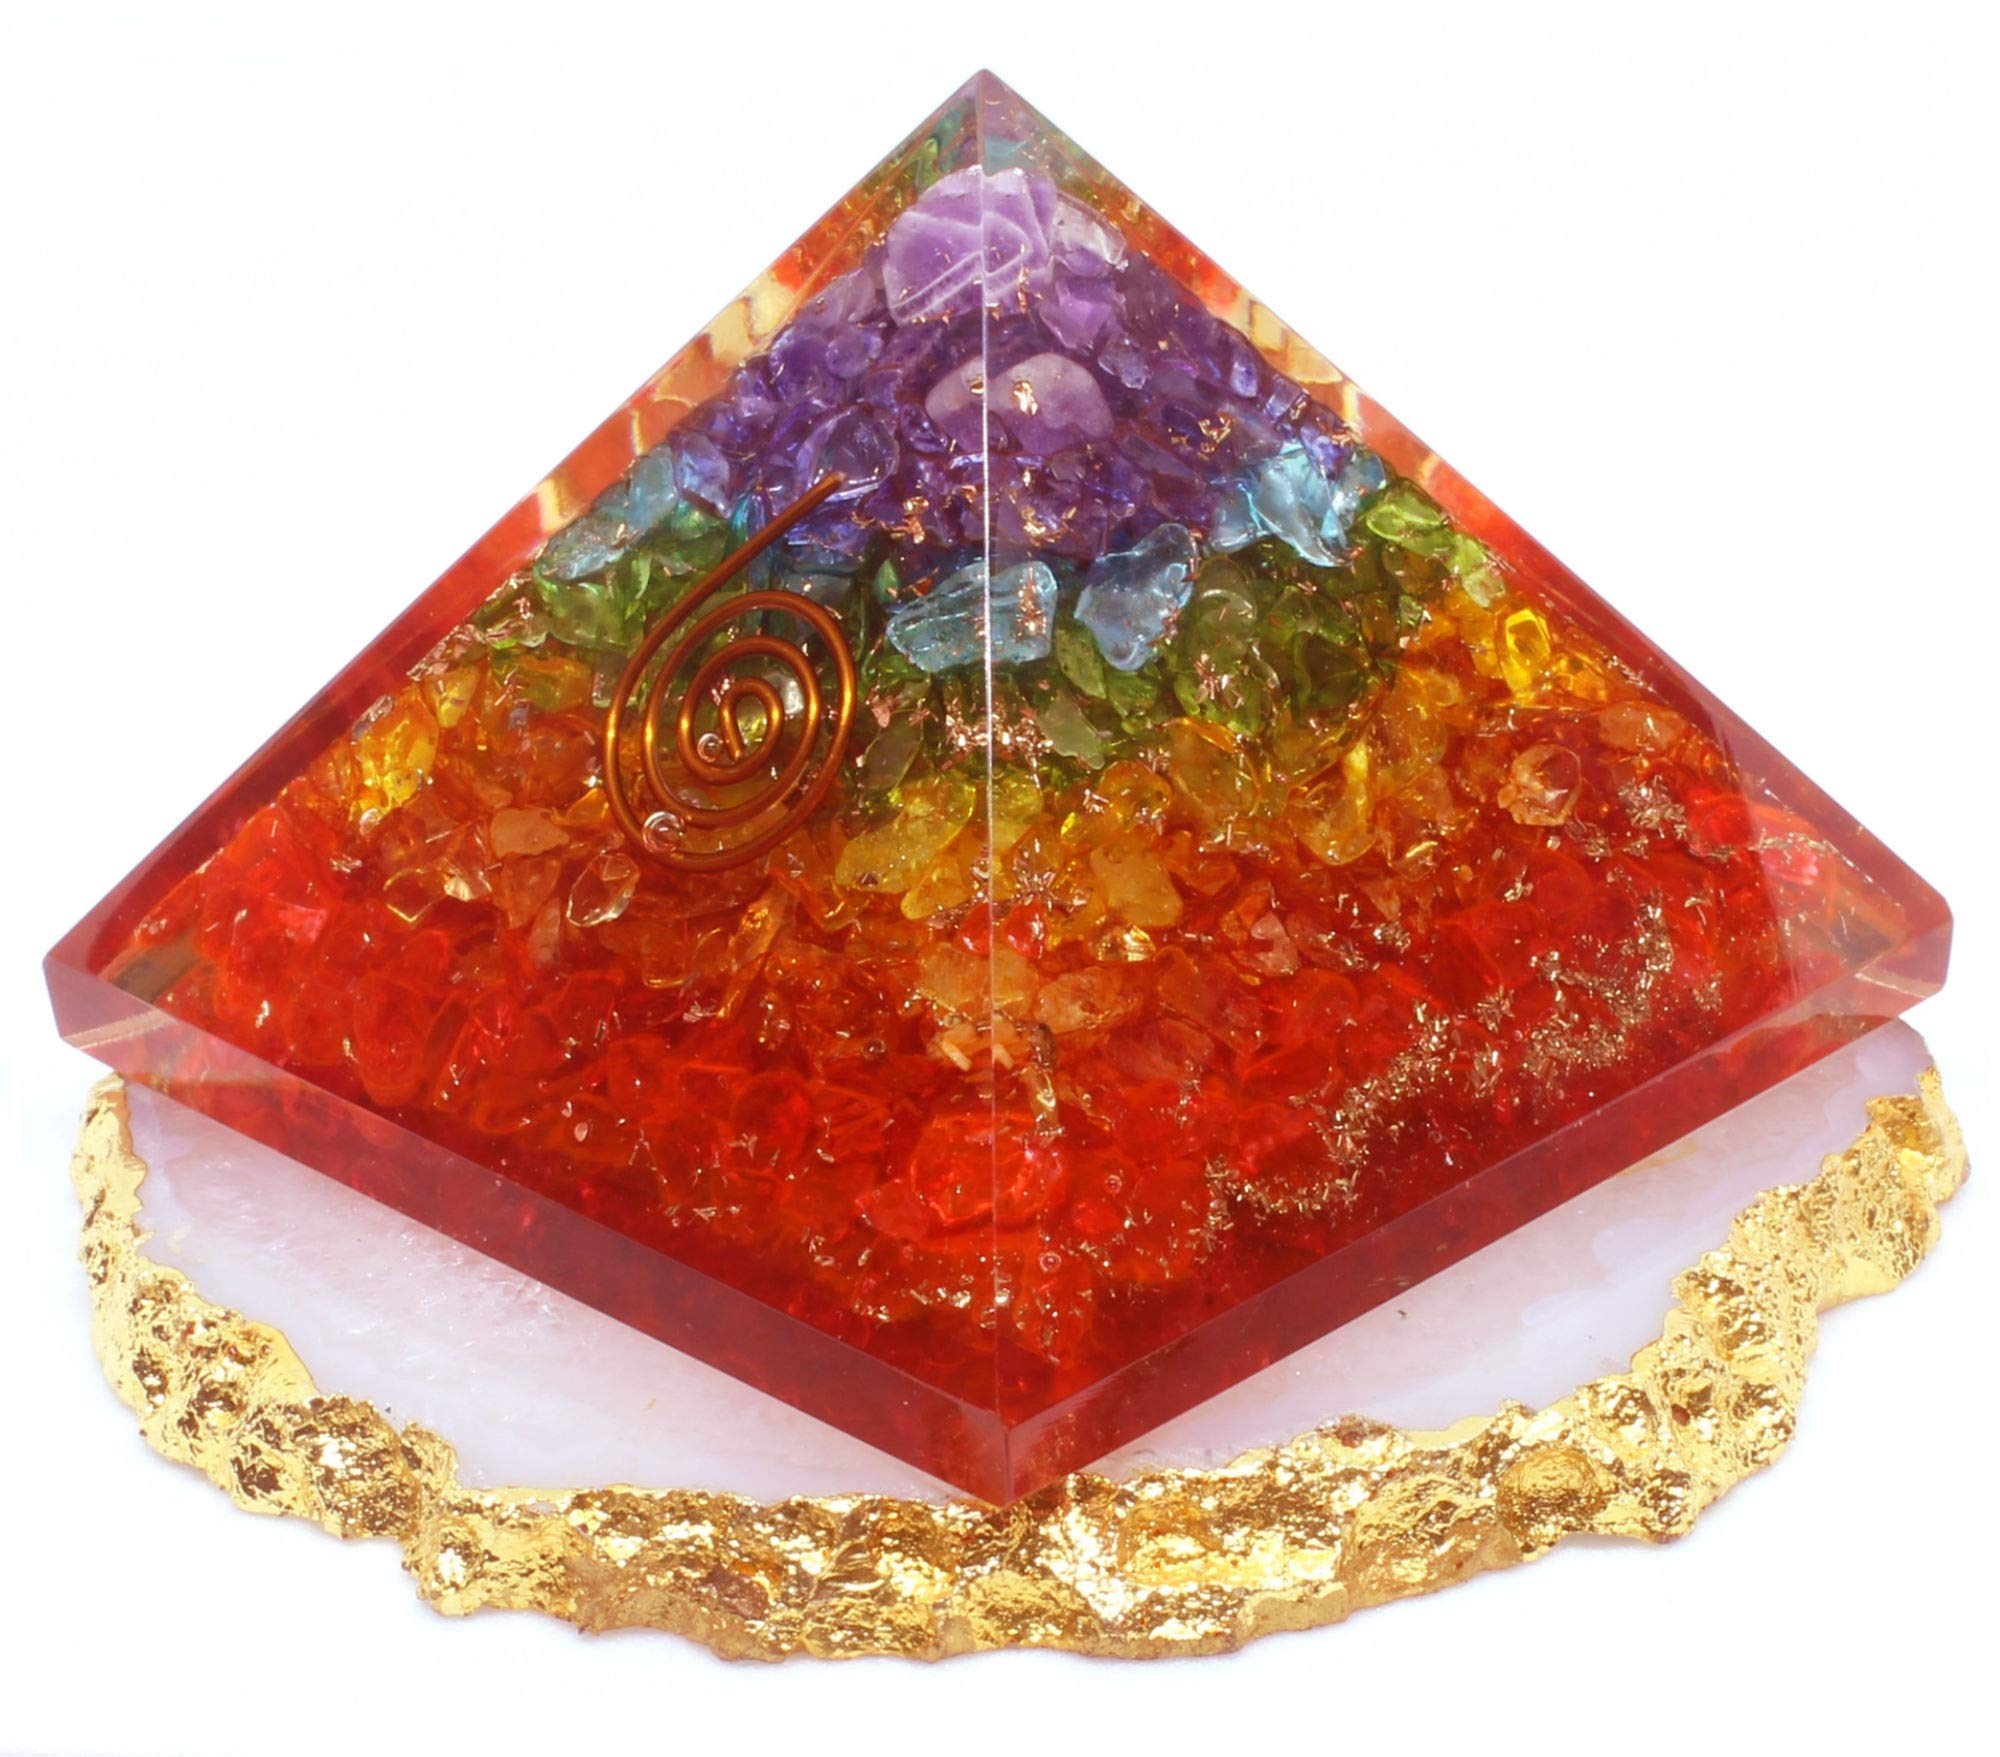 Orgone Pyramid - Healing Crystal based Orgonite Pyramid with Orgone Energy for Emf Protection - meditation - balancing chakra